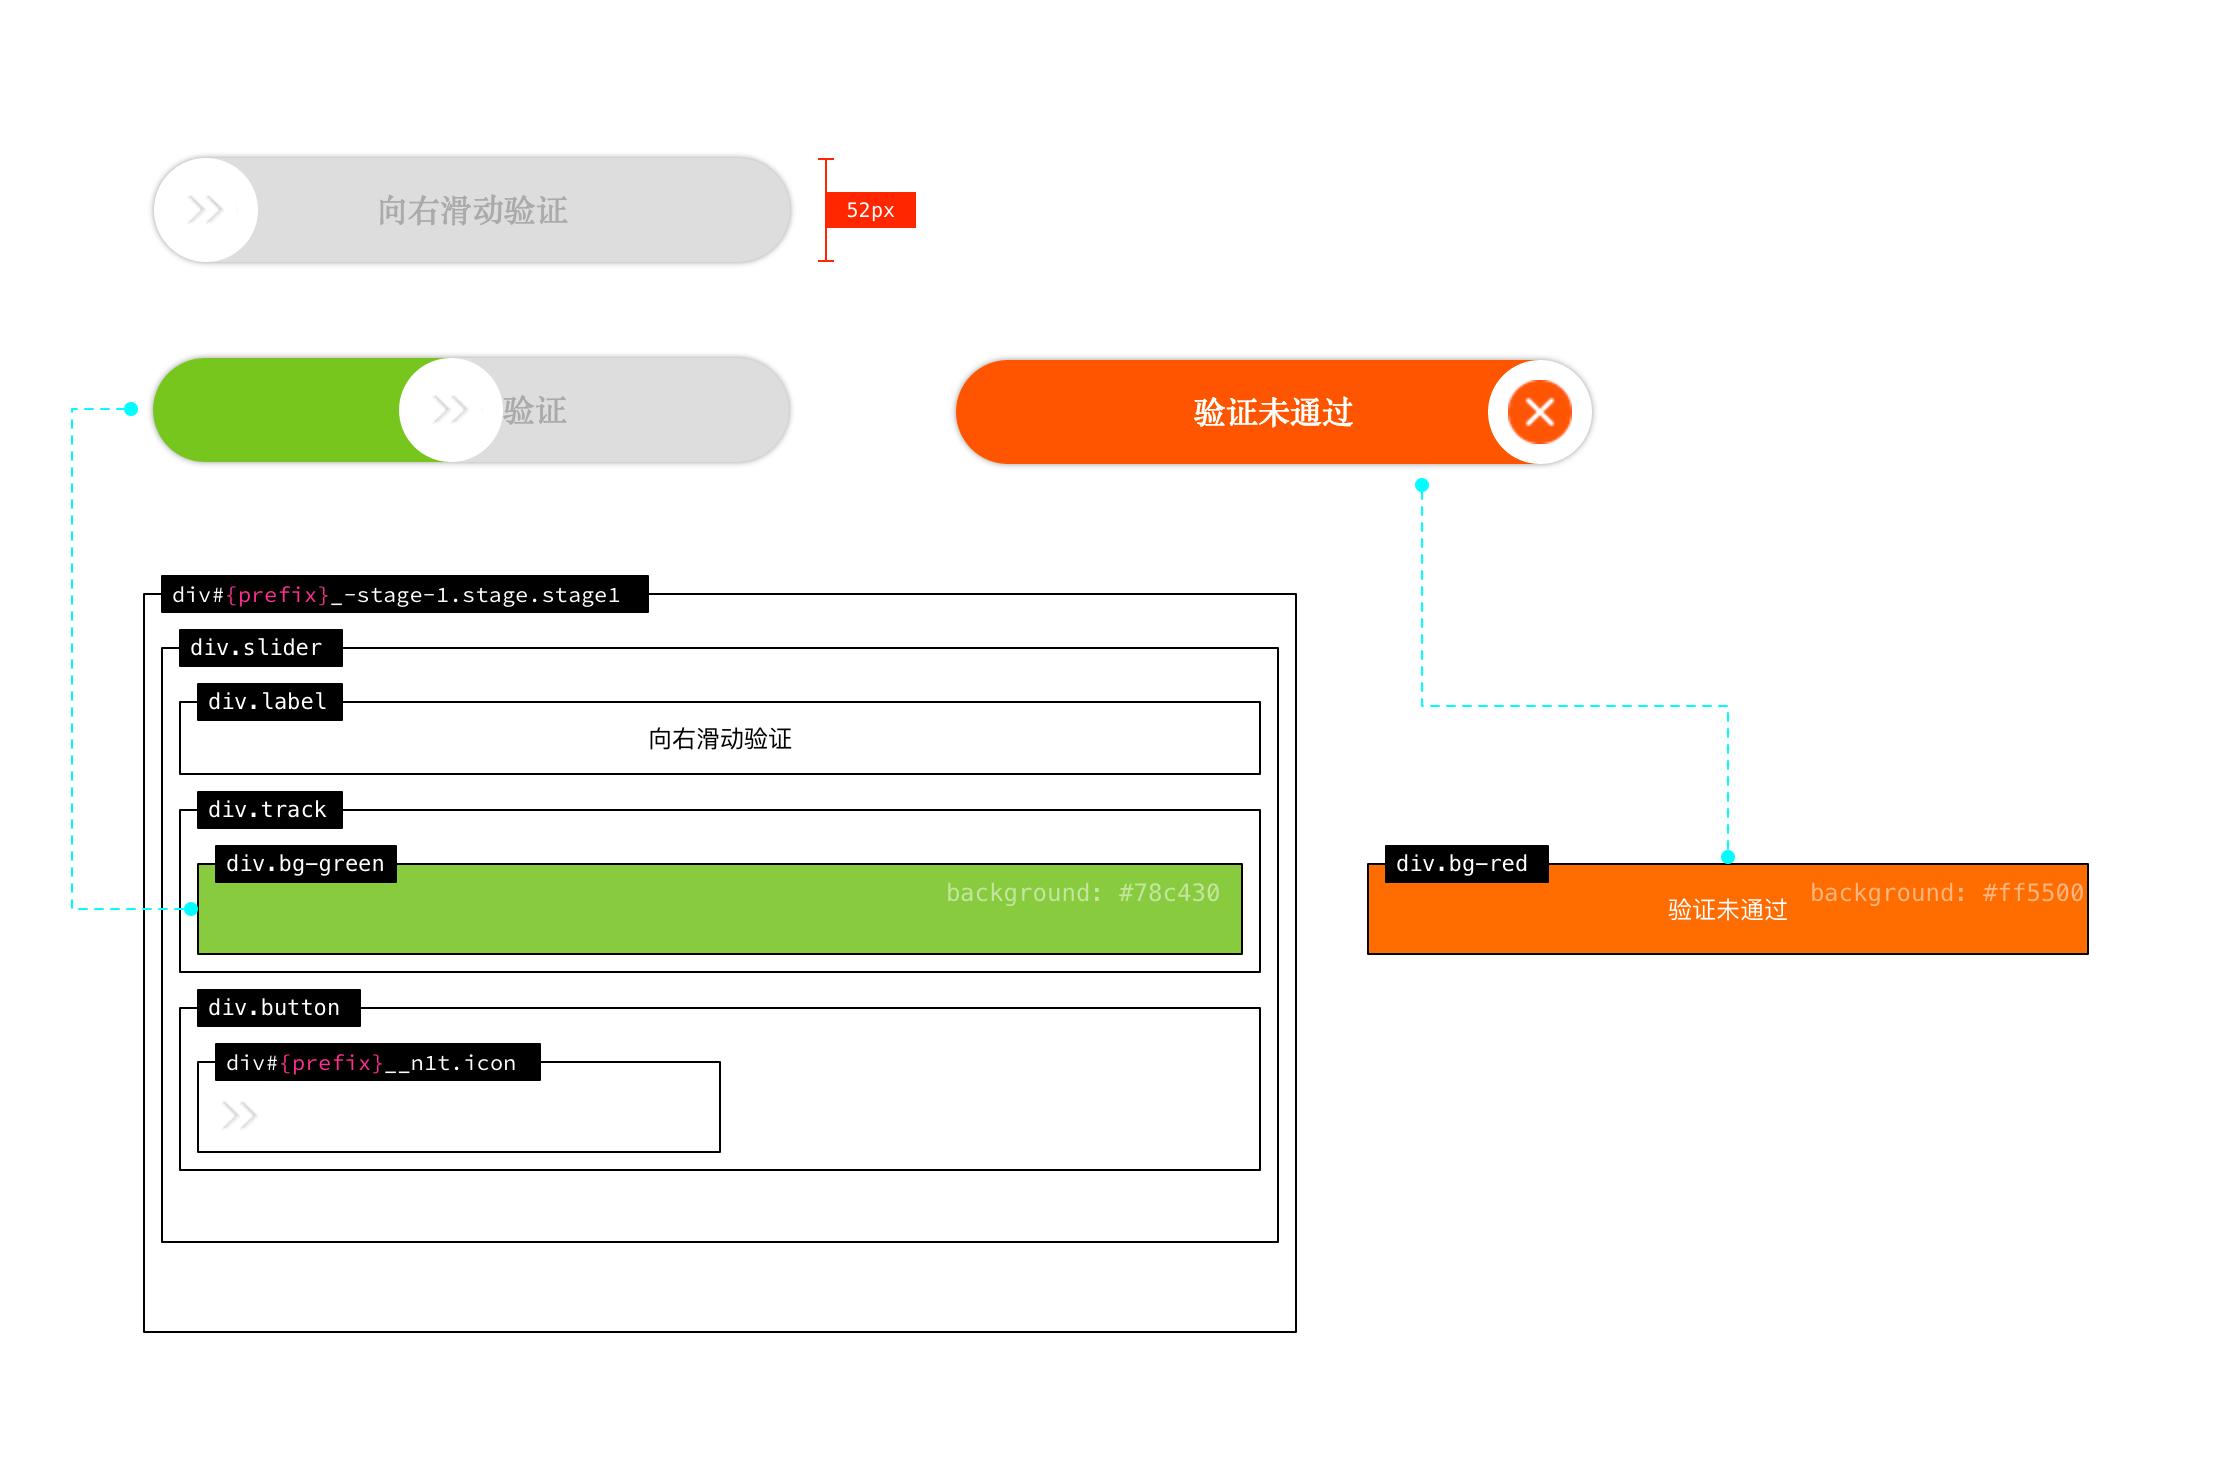 stage1的CSS定义